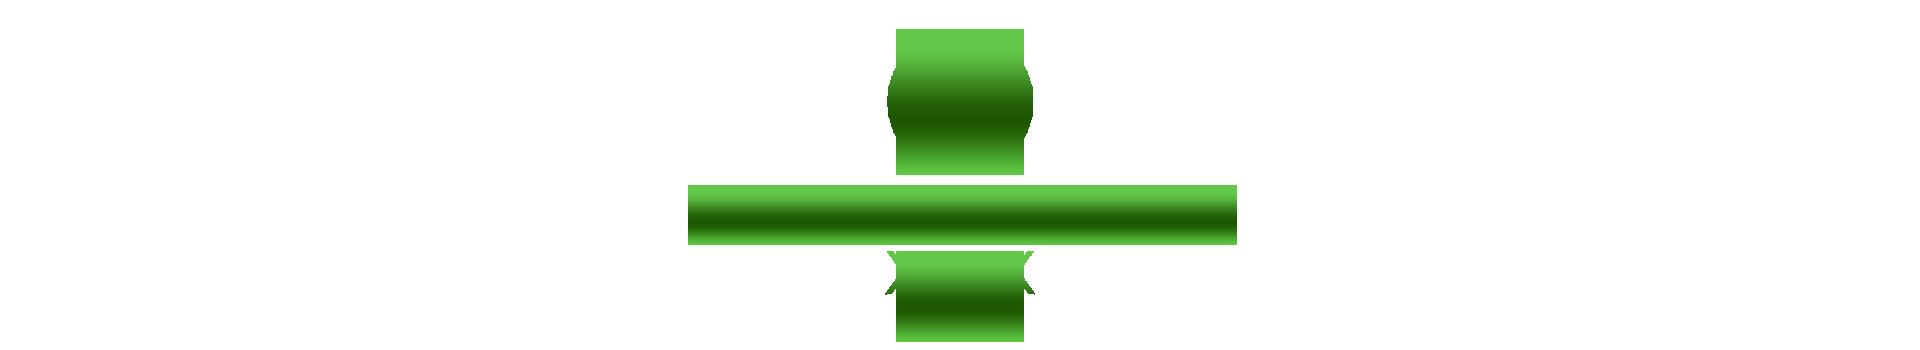 Meilleures Ventes Xbox One